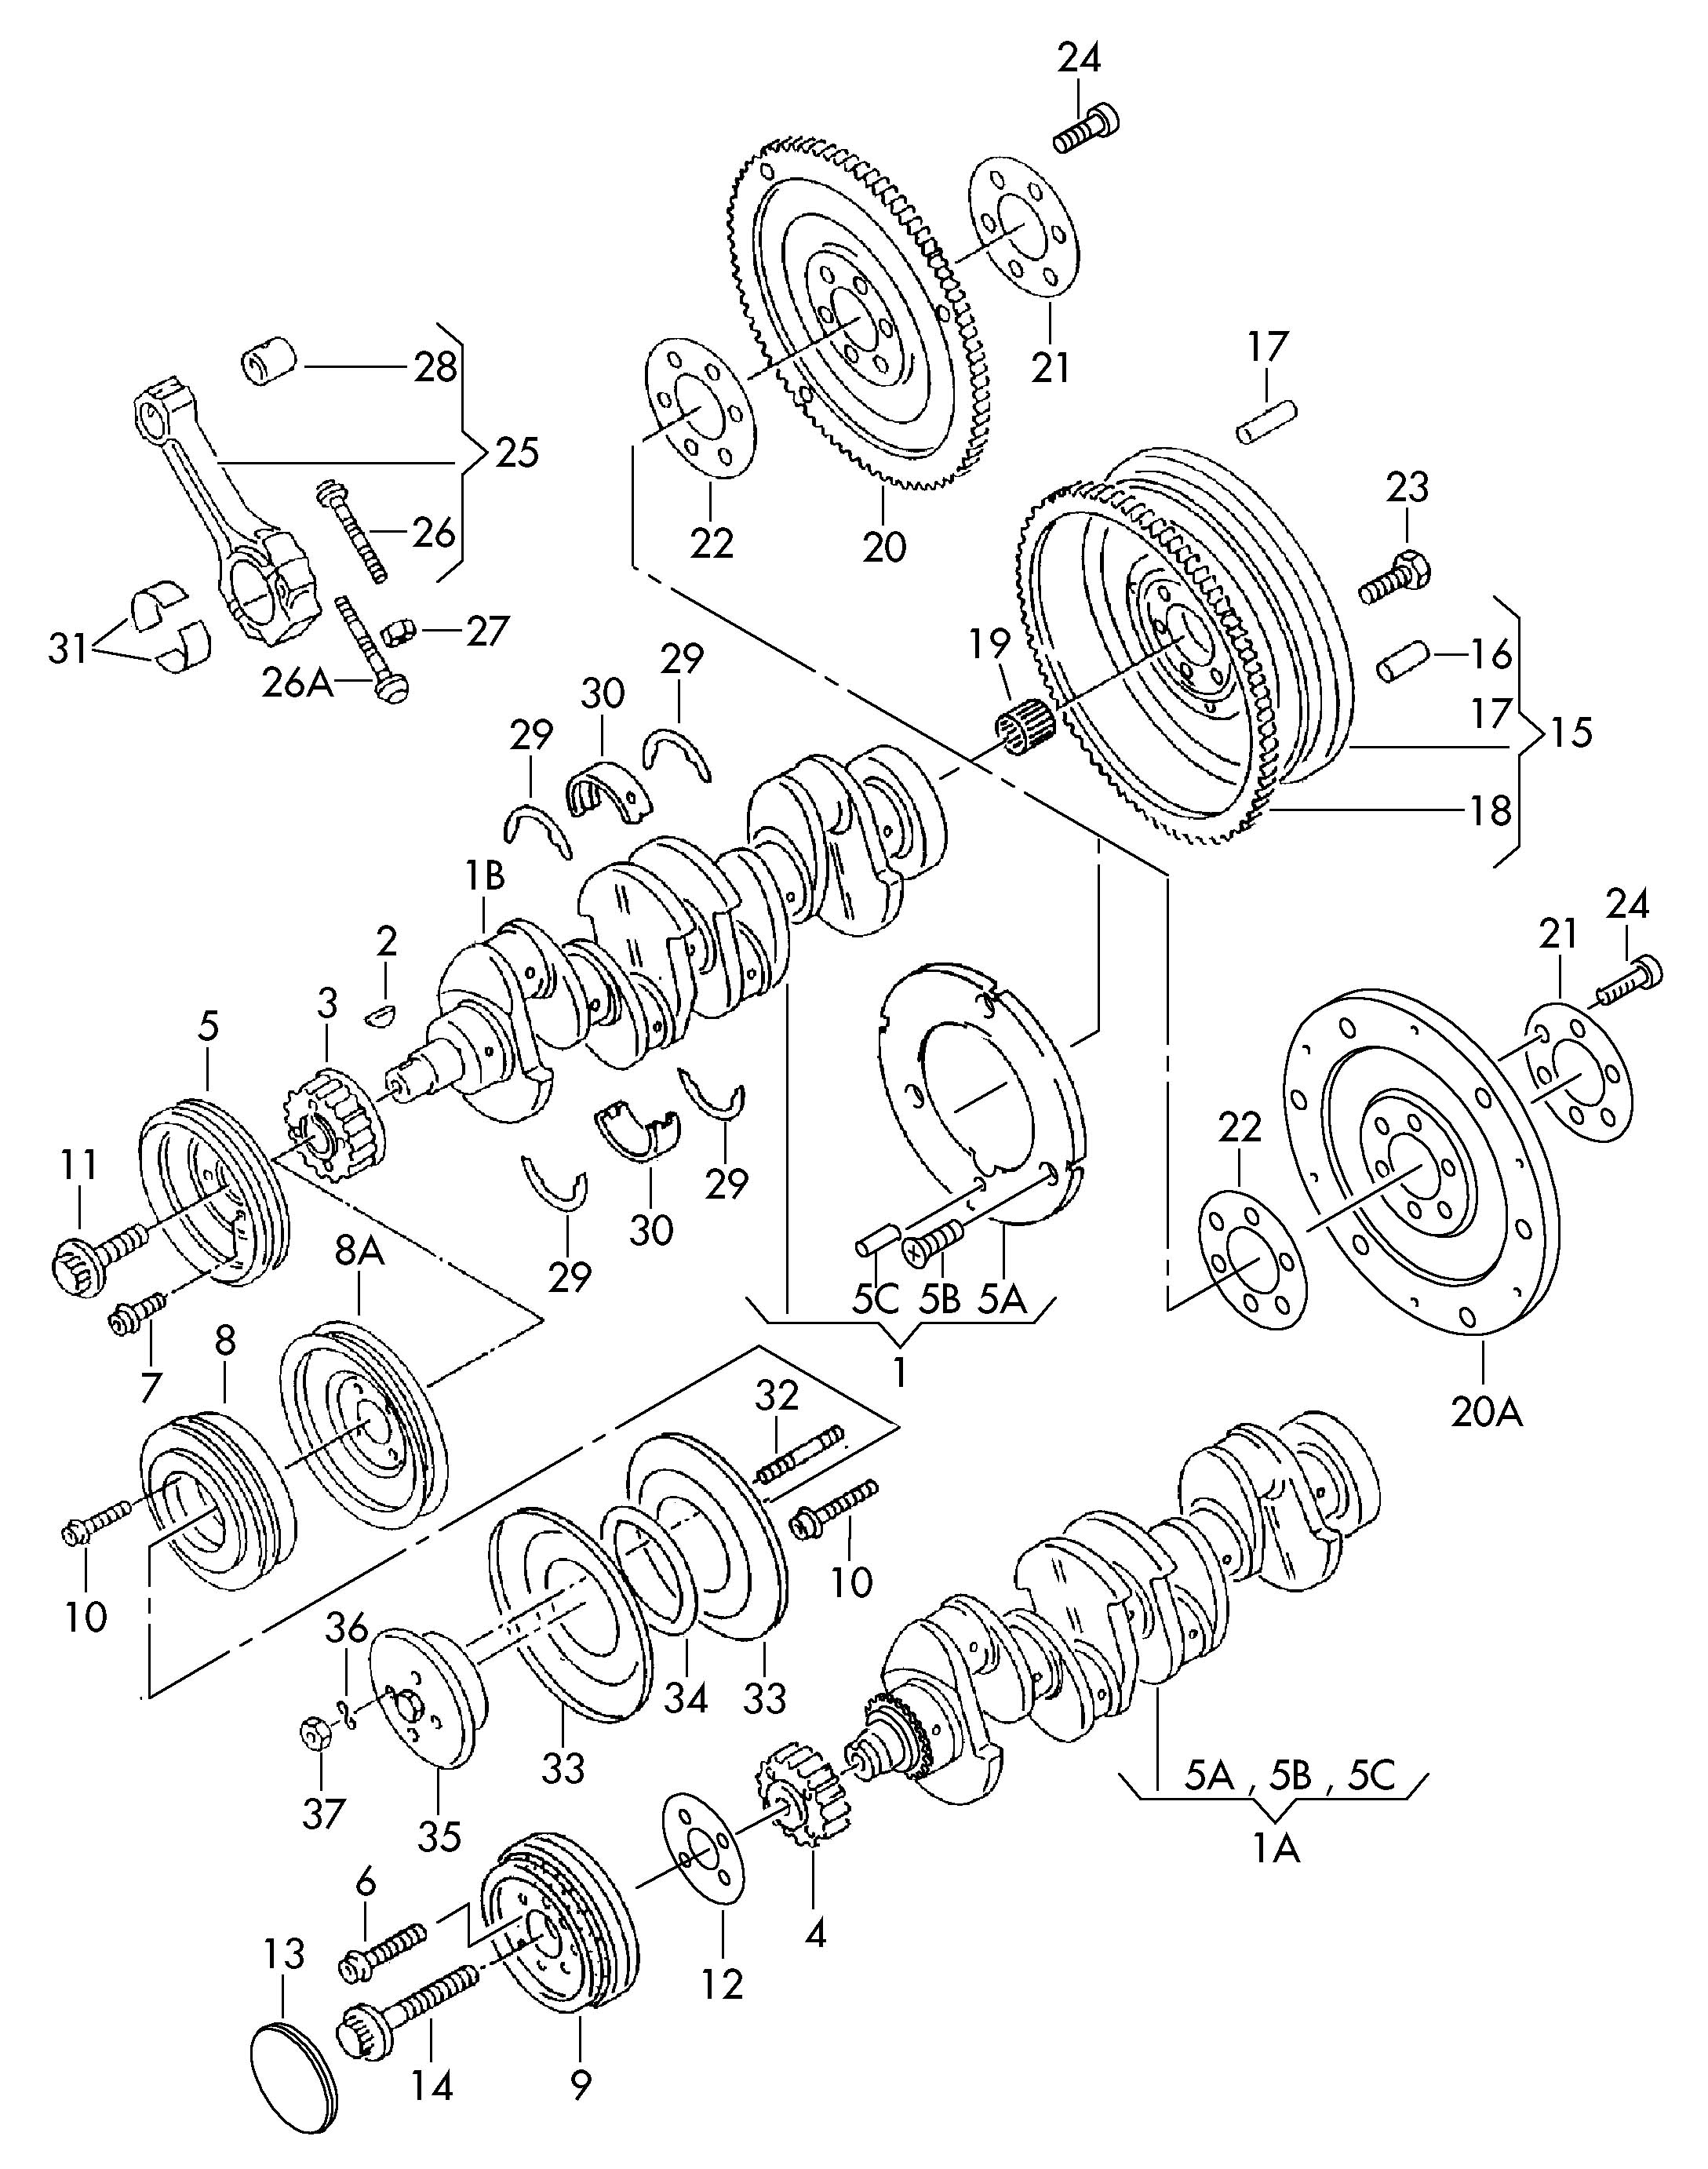 2002 Volkswagen Engine Piston Wrist Pin Bushing. Engine